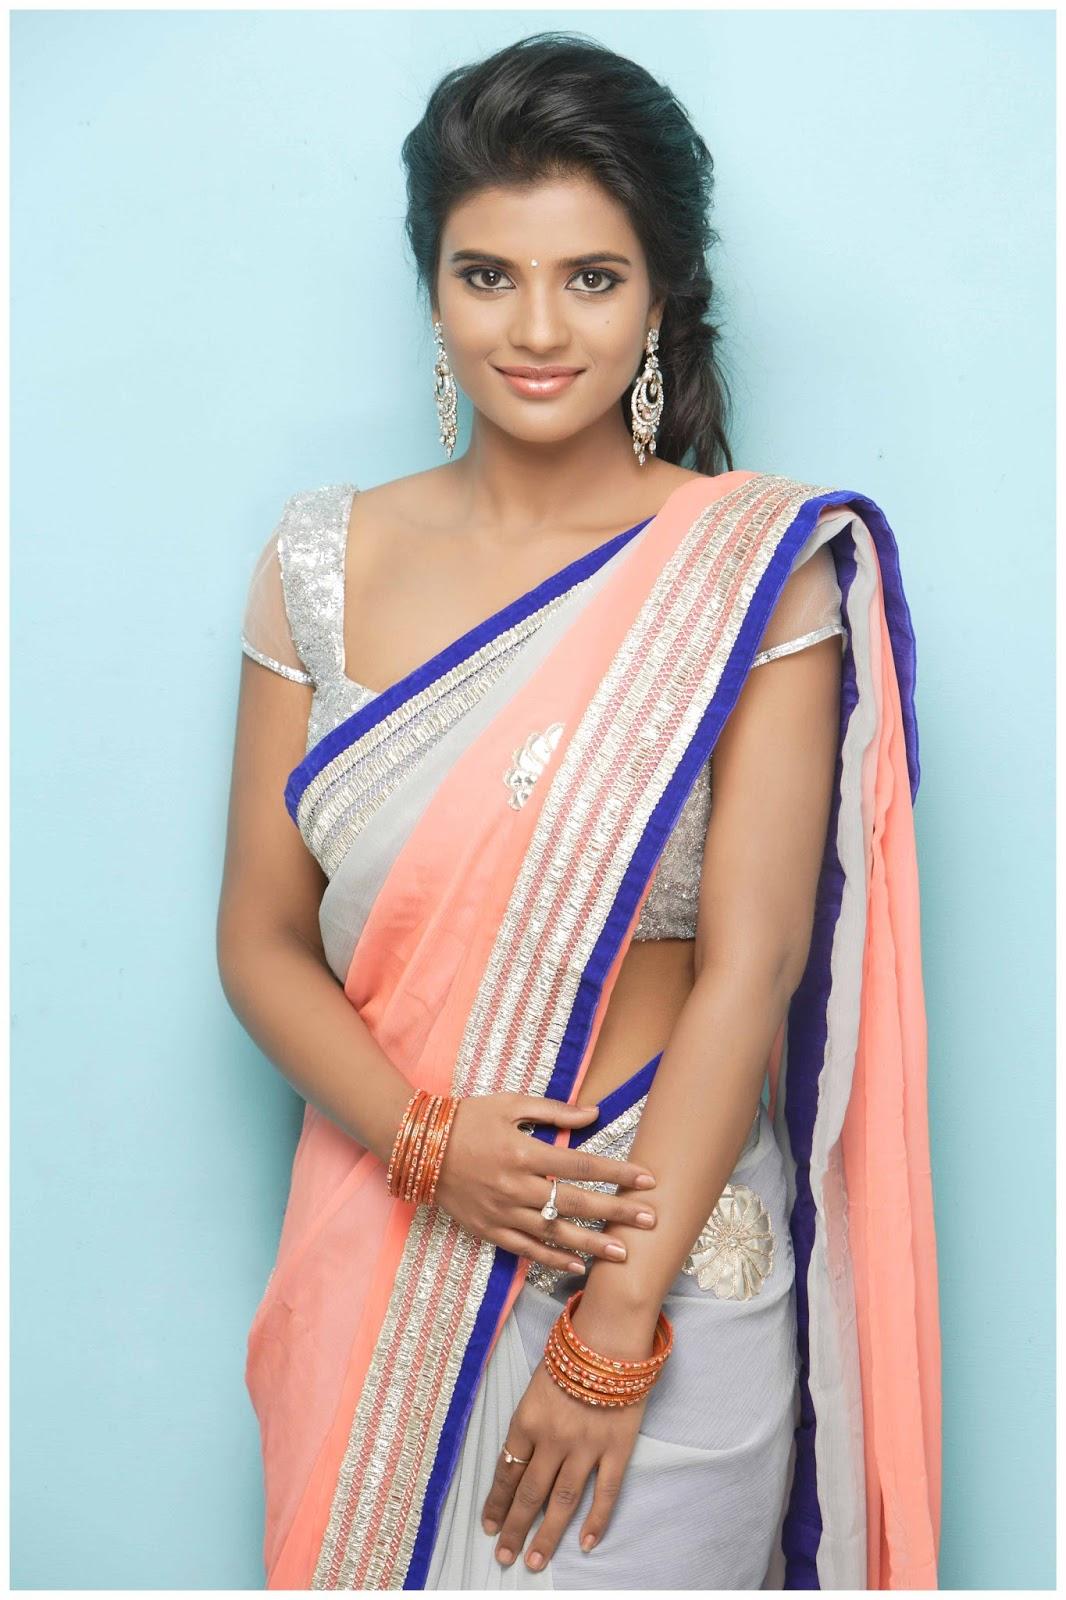 Karthika Nair Hot Navel In Saree Aishwarya Rajesh...